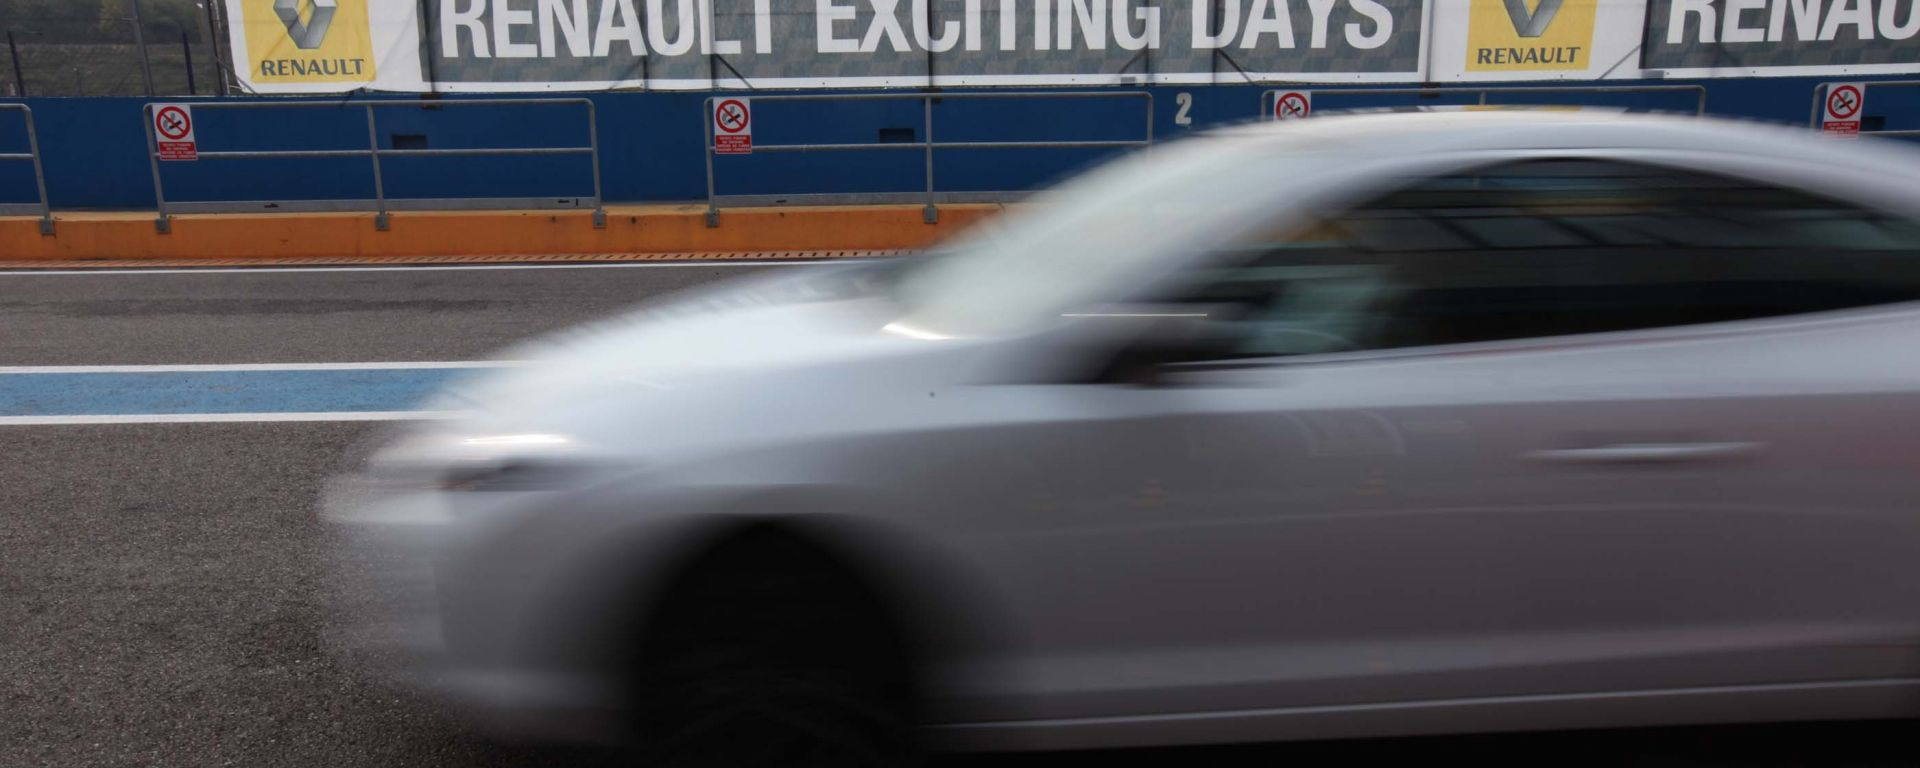 Renault Exciting Days, ultimo giro il 7 e 8 novembre